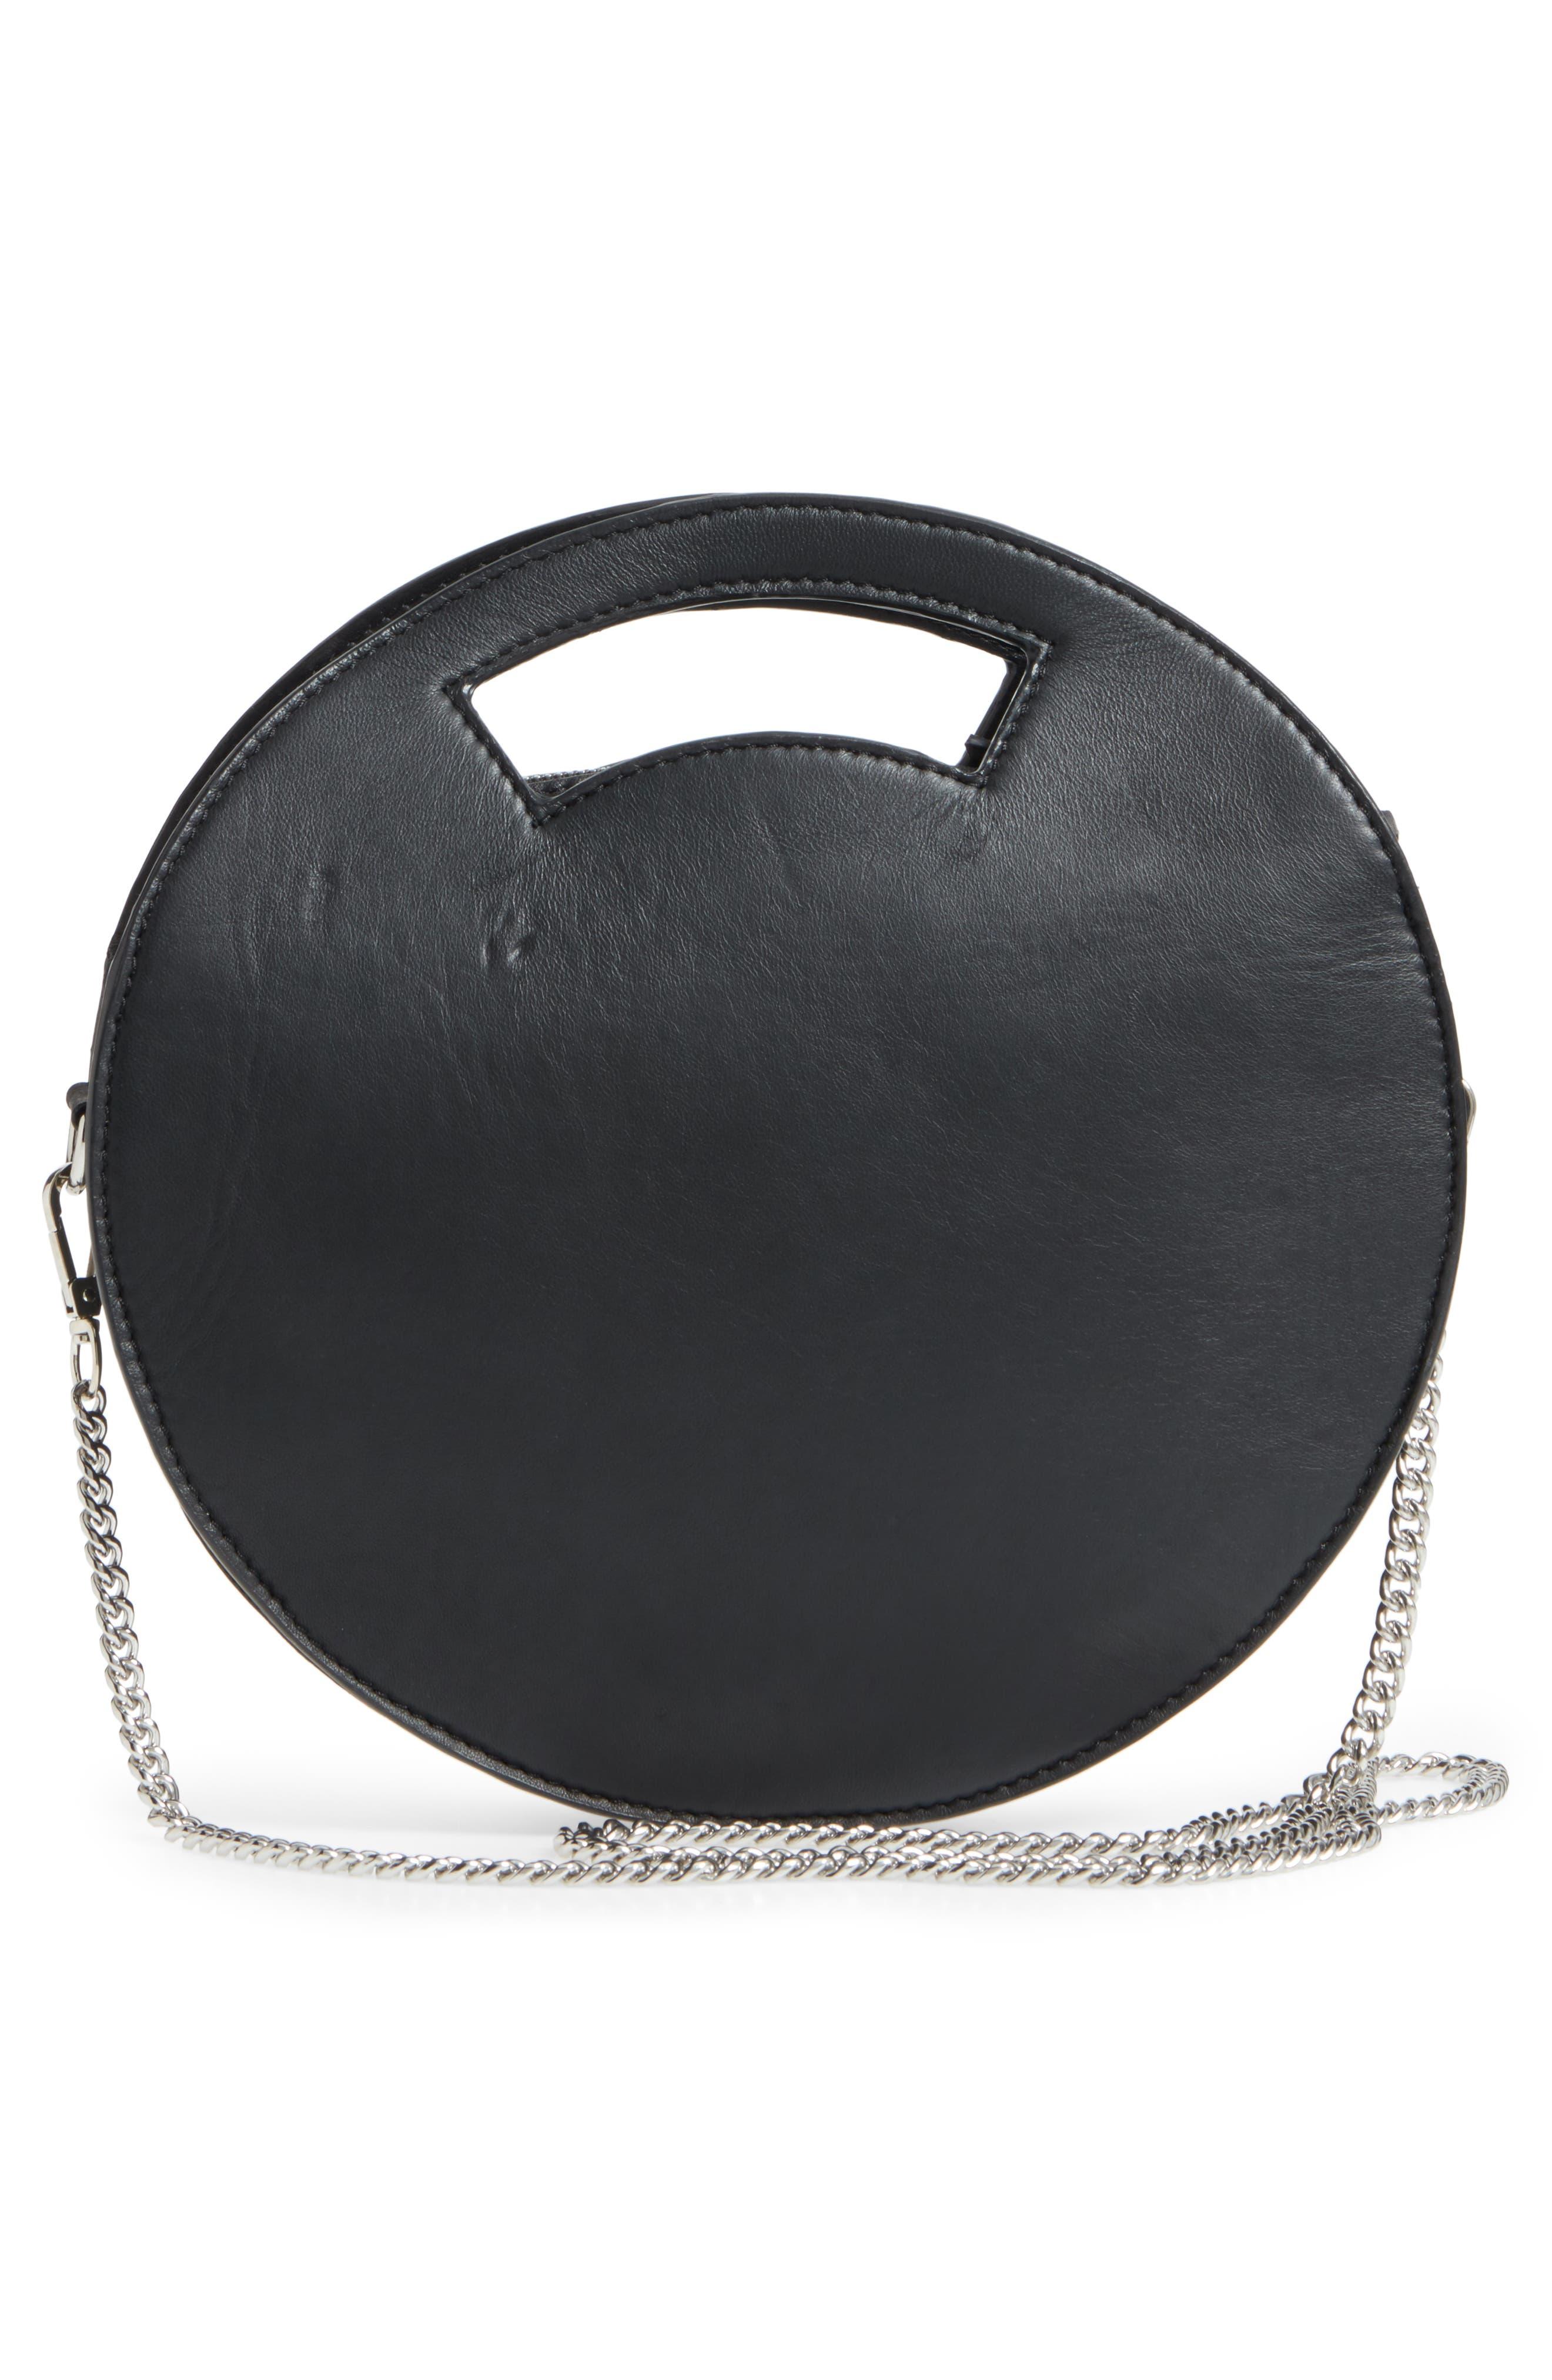 Premium Leather Circle Crossbody Bag,                             Alternate thumbnail 3, color,                             Black